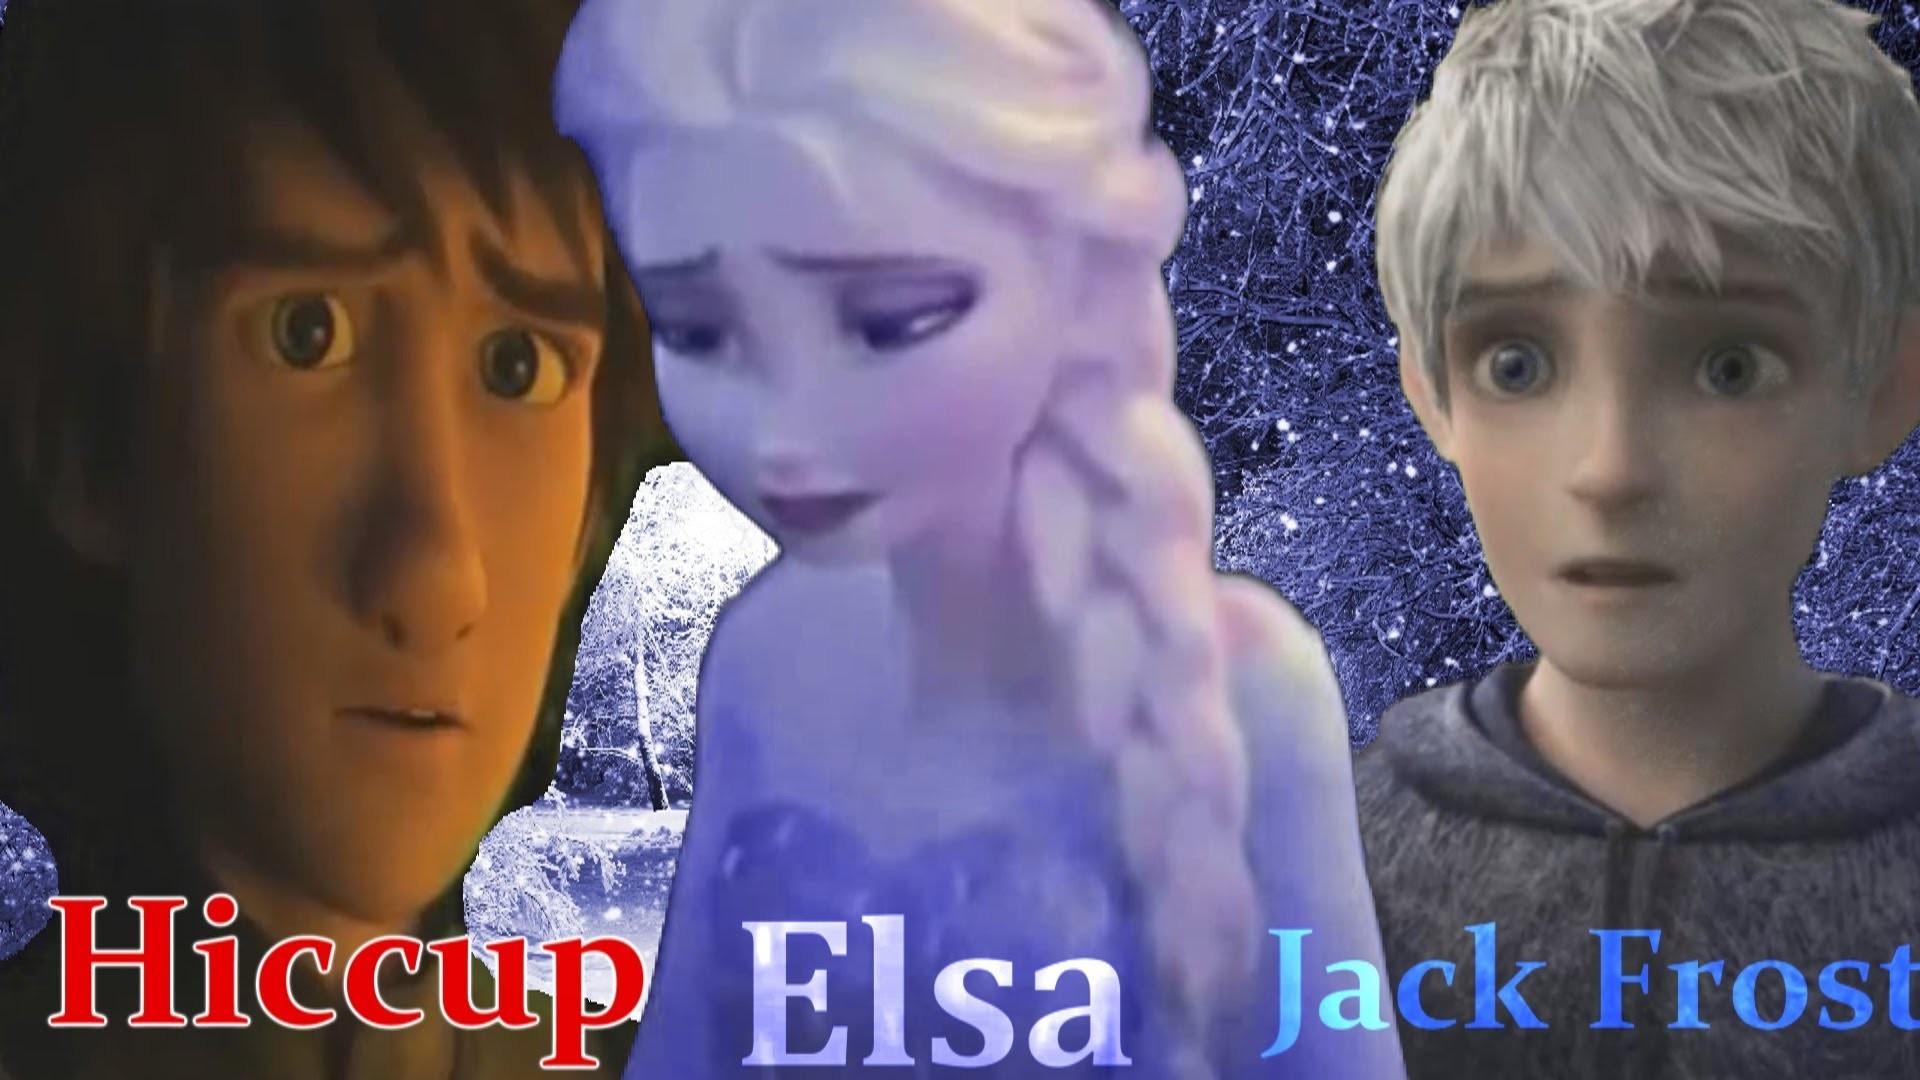 Hiccup-Elsa-Jack